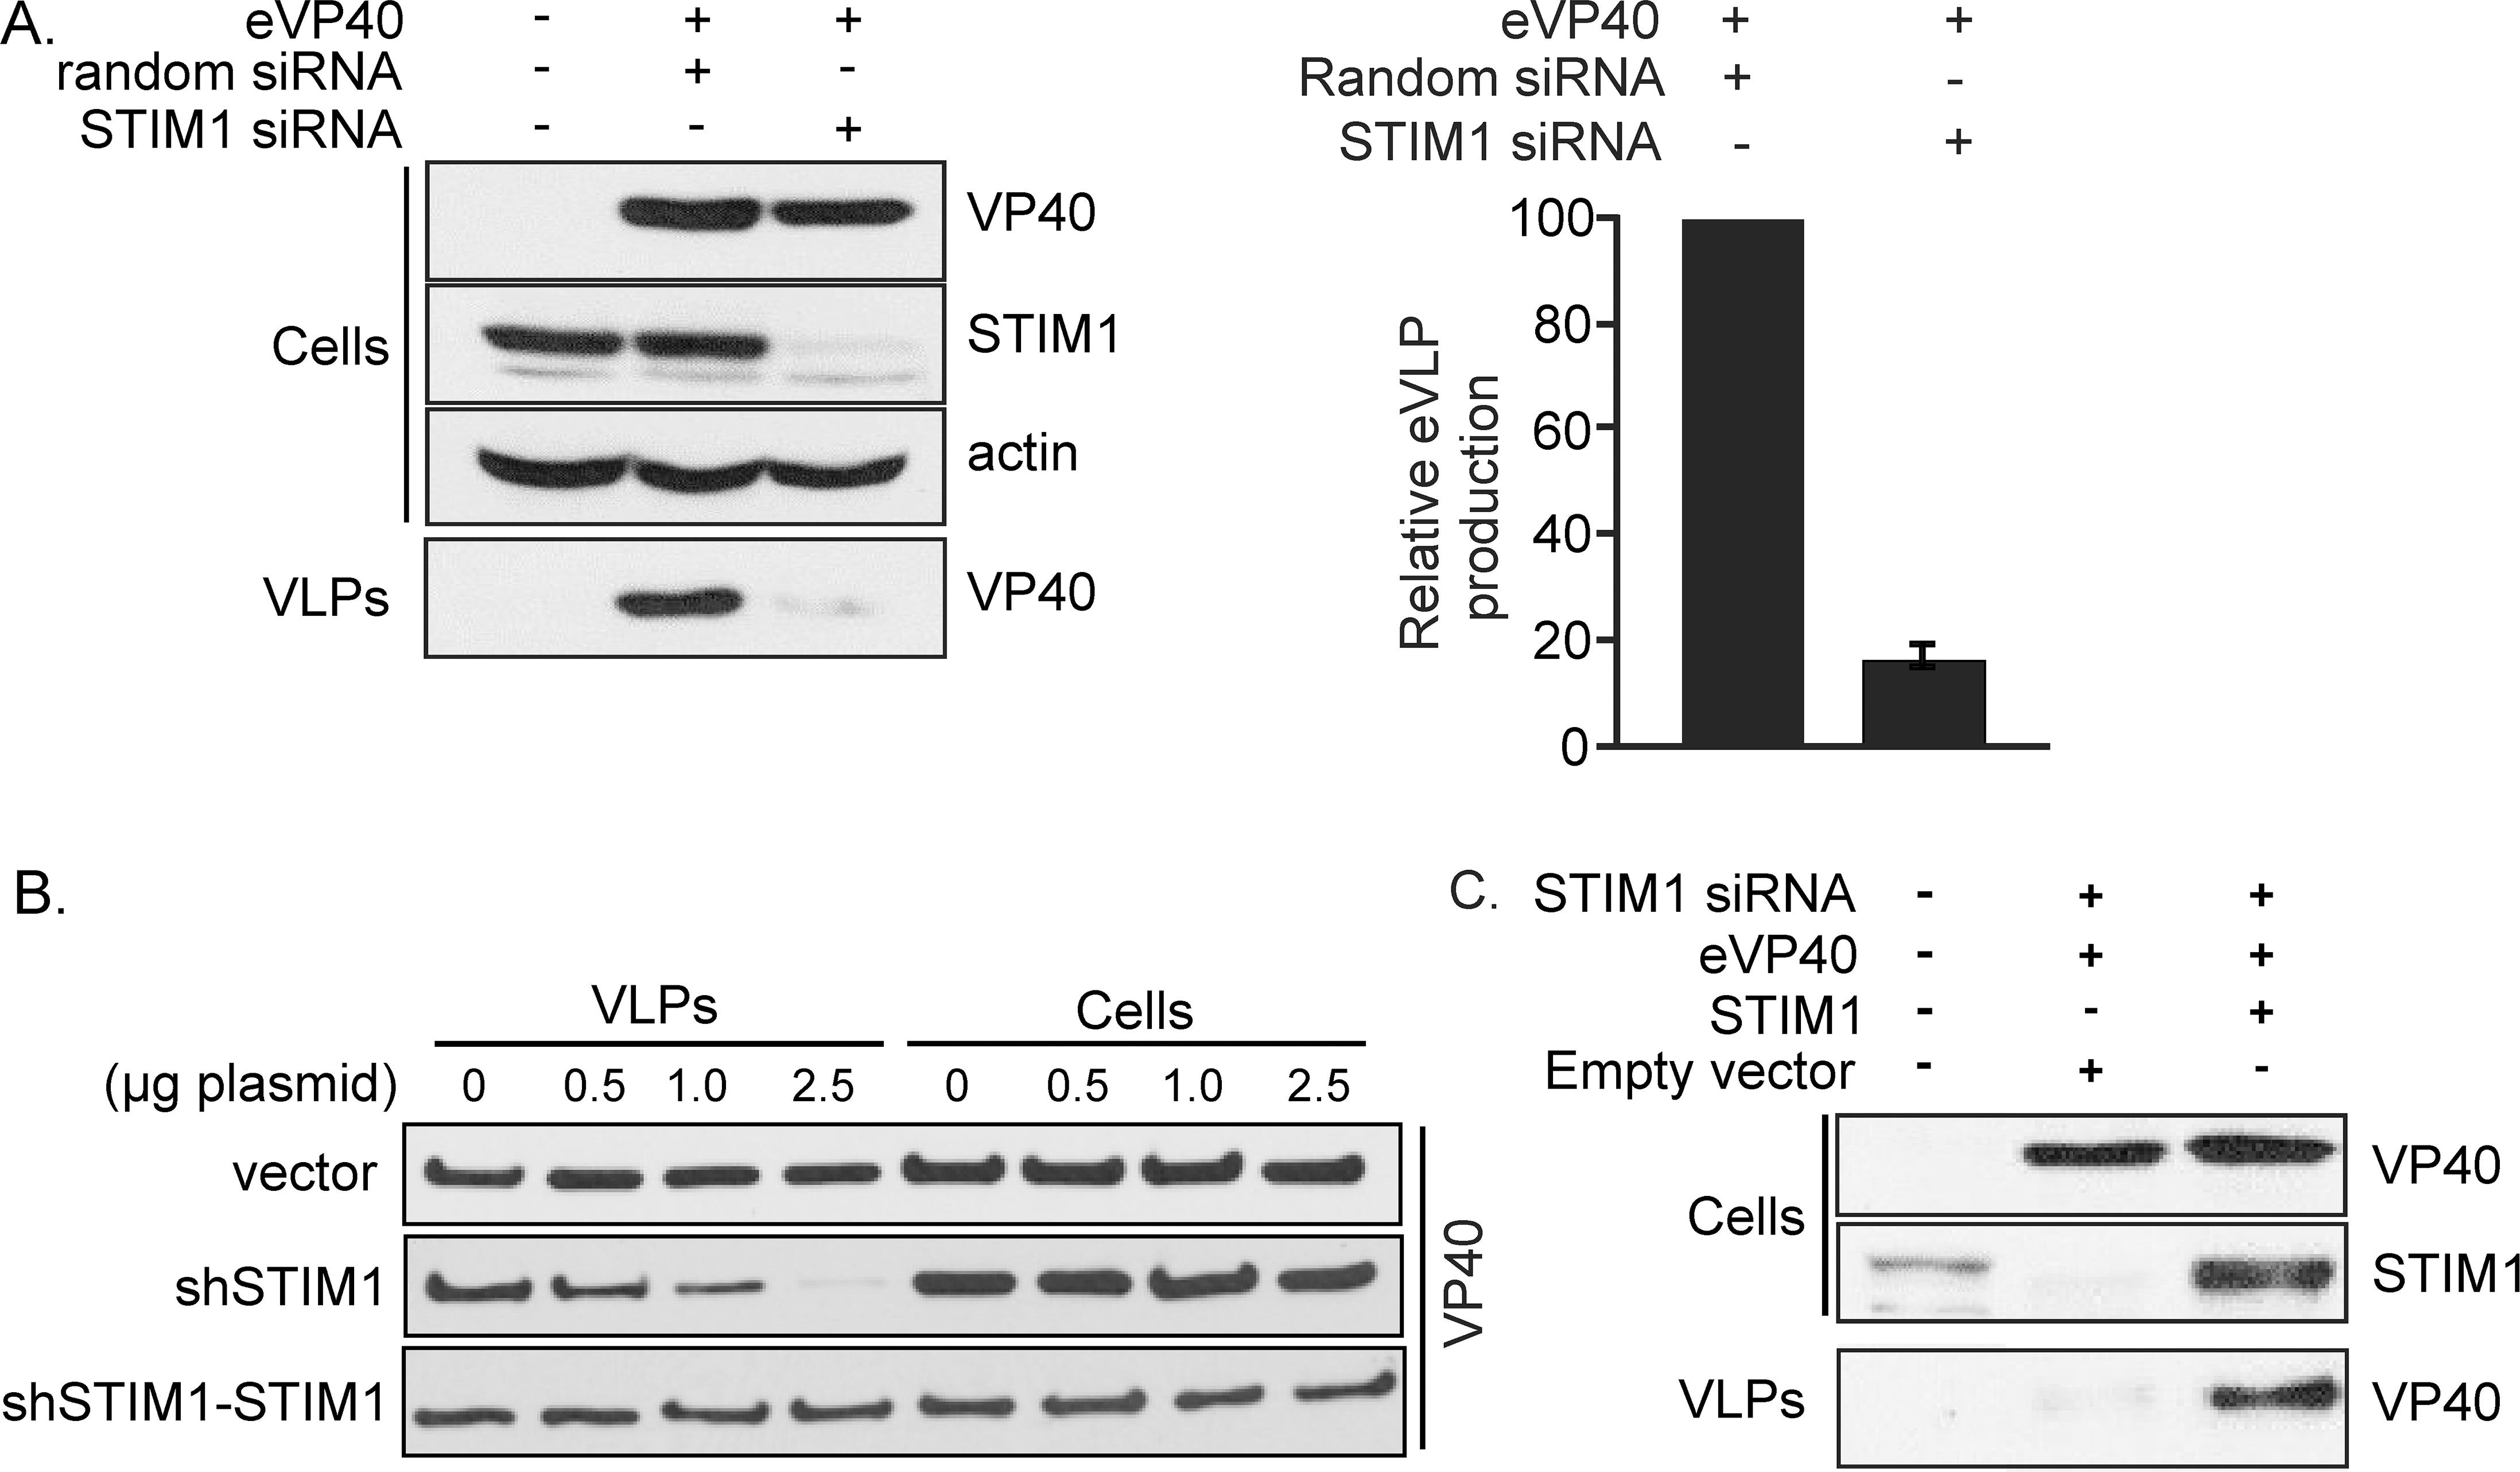 STIM1 suppression inhibits egress of eVP40 VLPs.